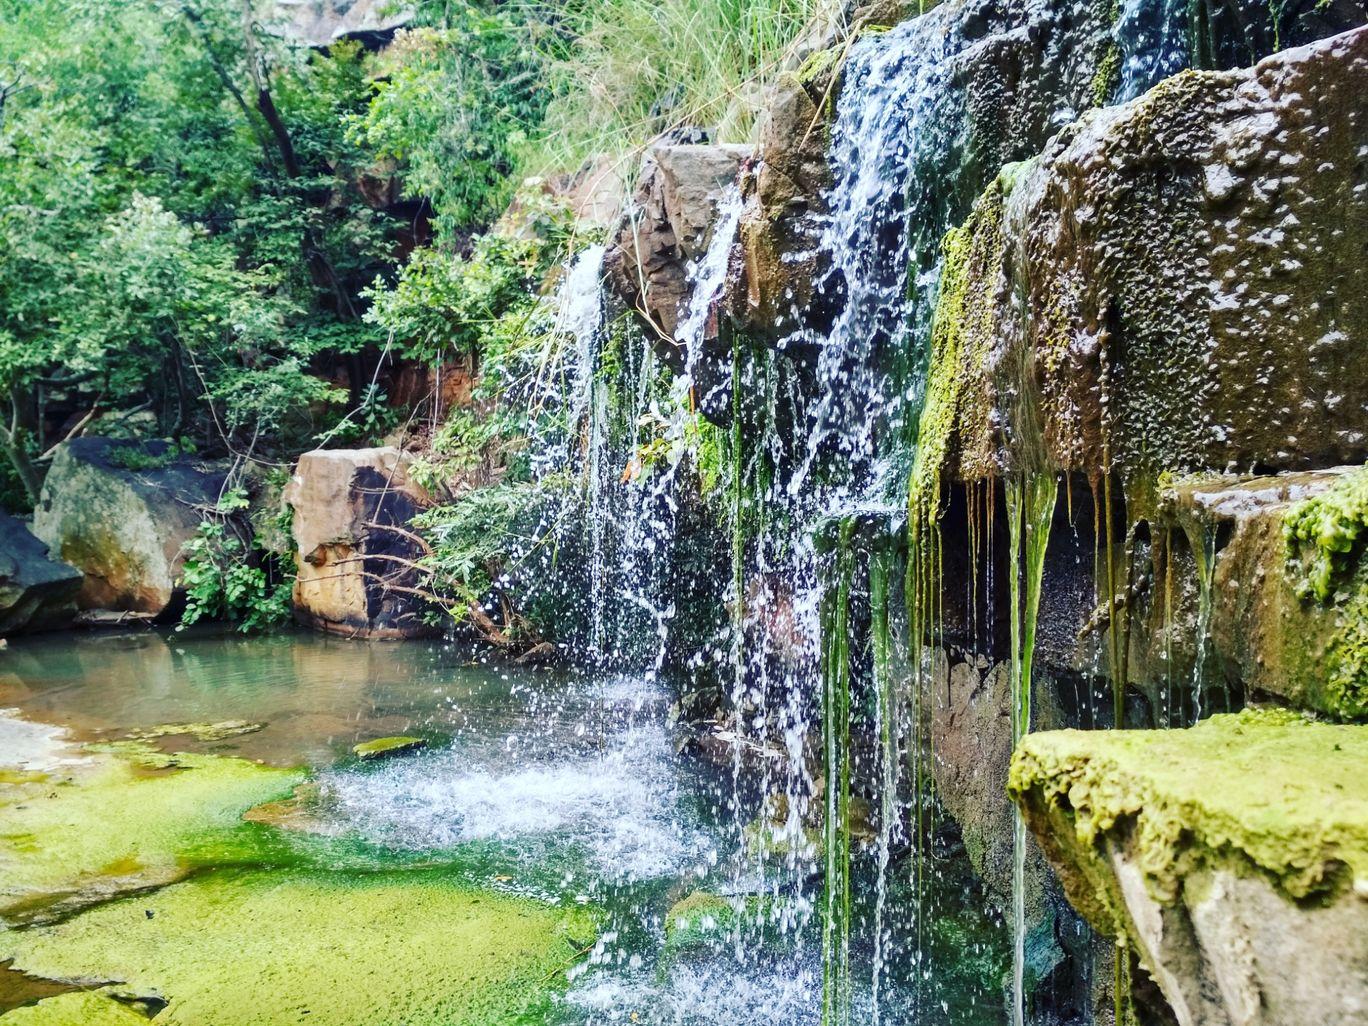 Photo of Mallela Thirtham Waterfall By Venu Madhav Gajavelli